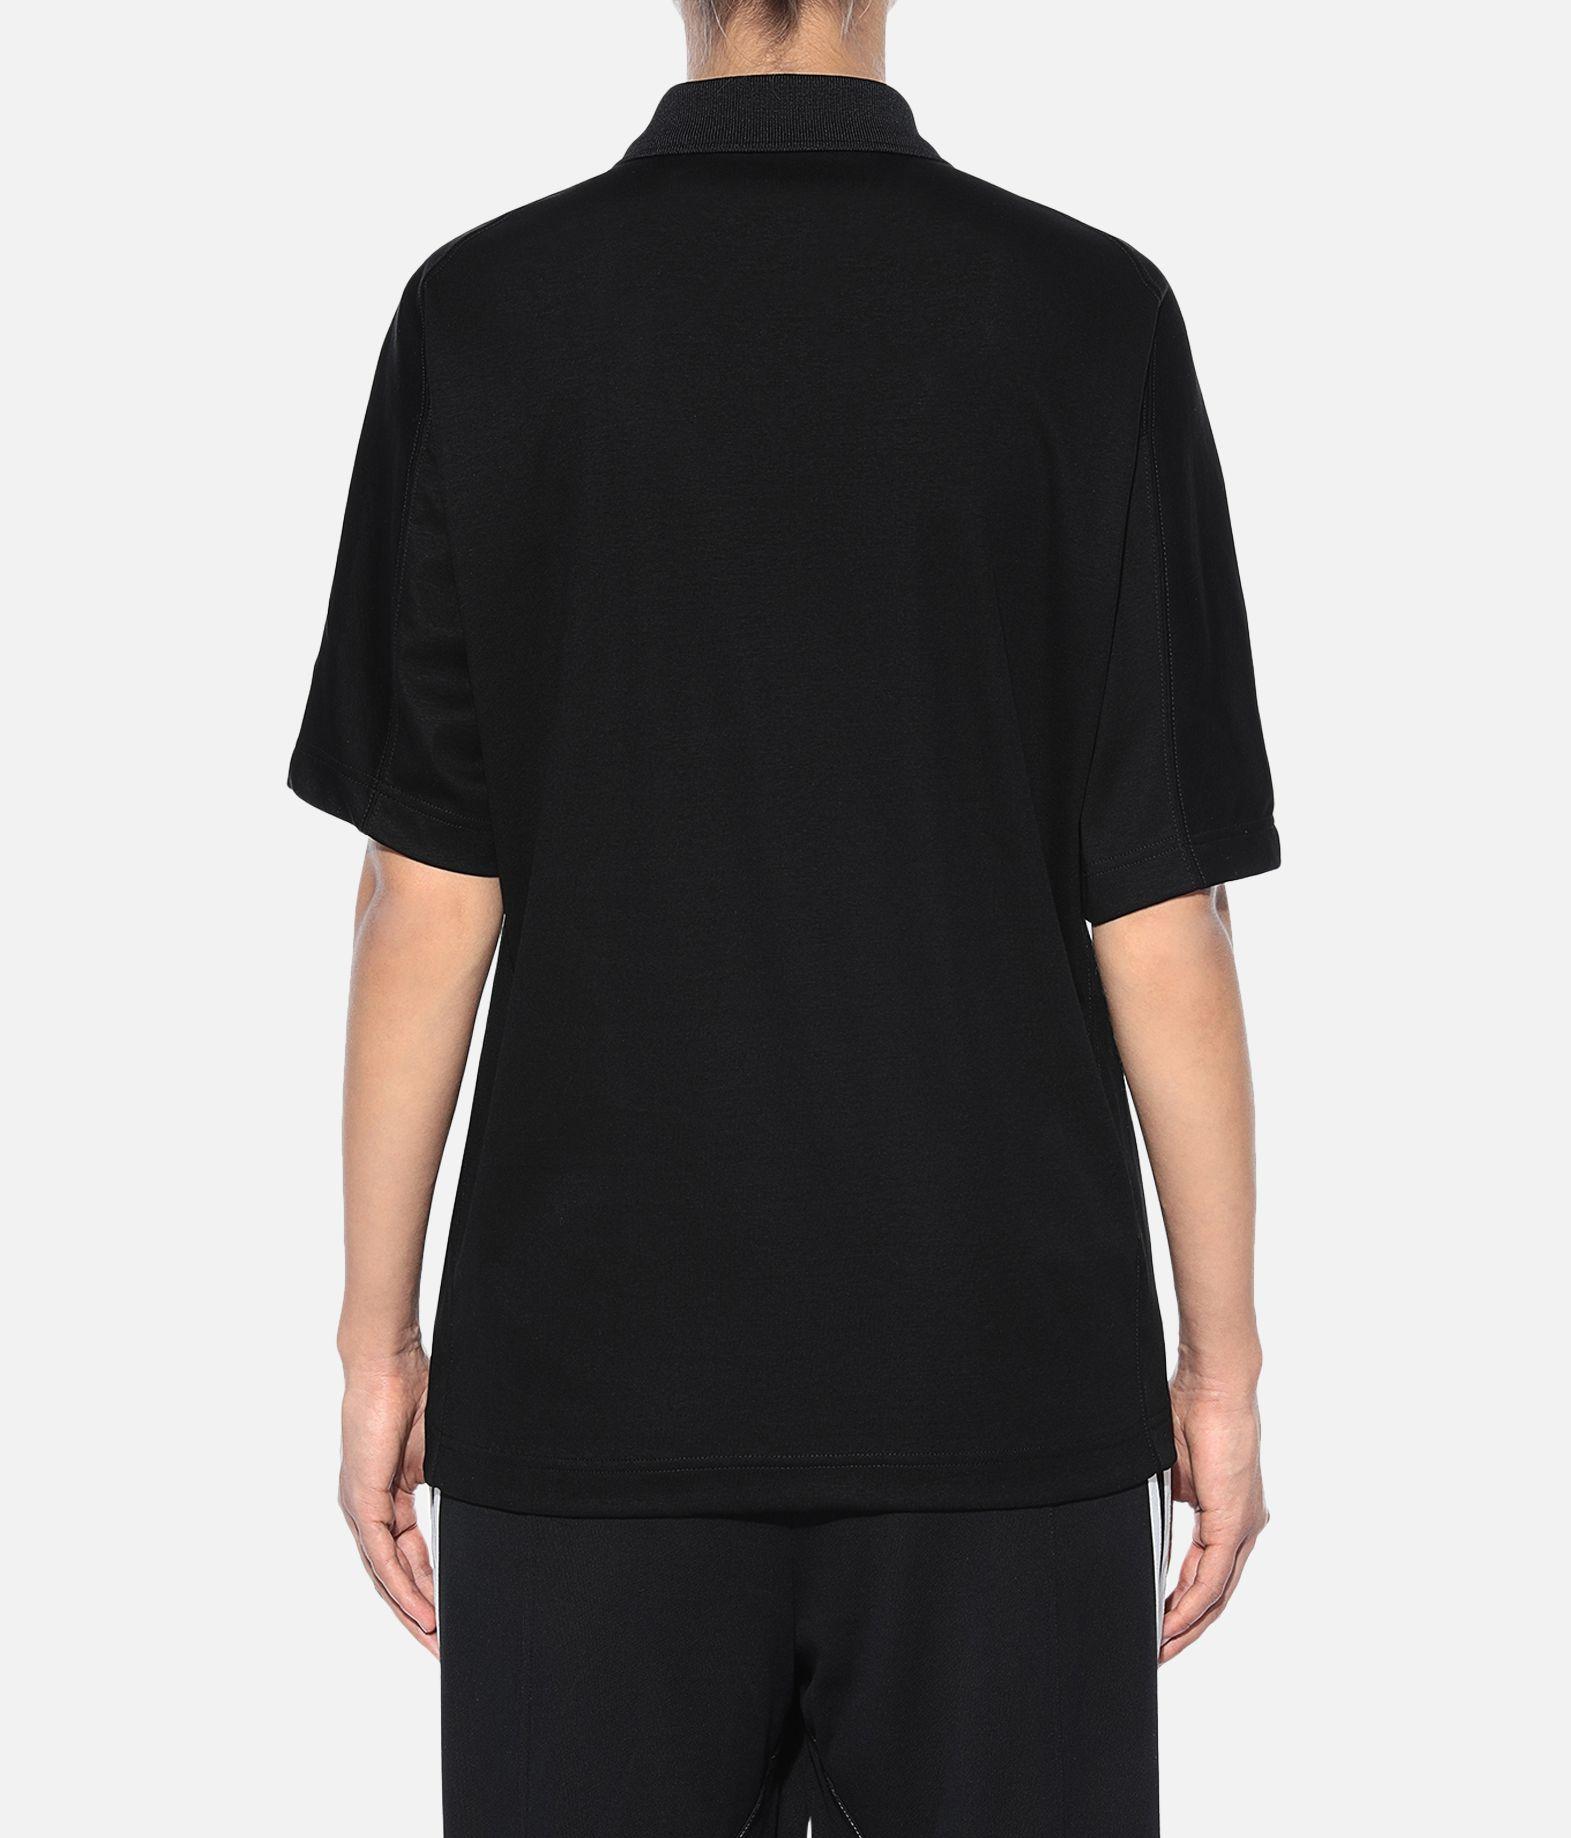 Y-3 Y-3 New Classic Polo Shirt  ポロシャツ レディース d